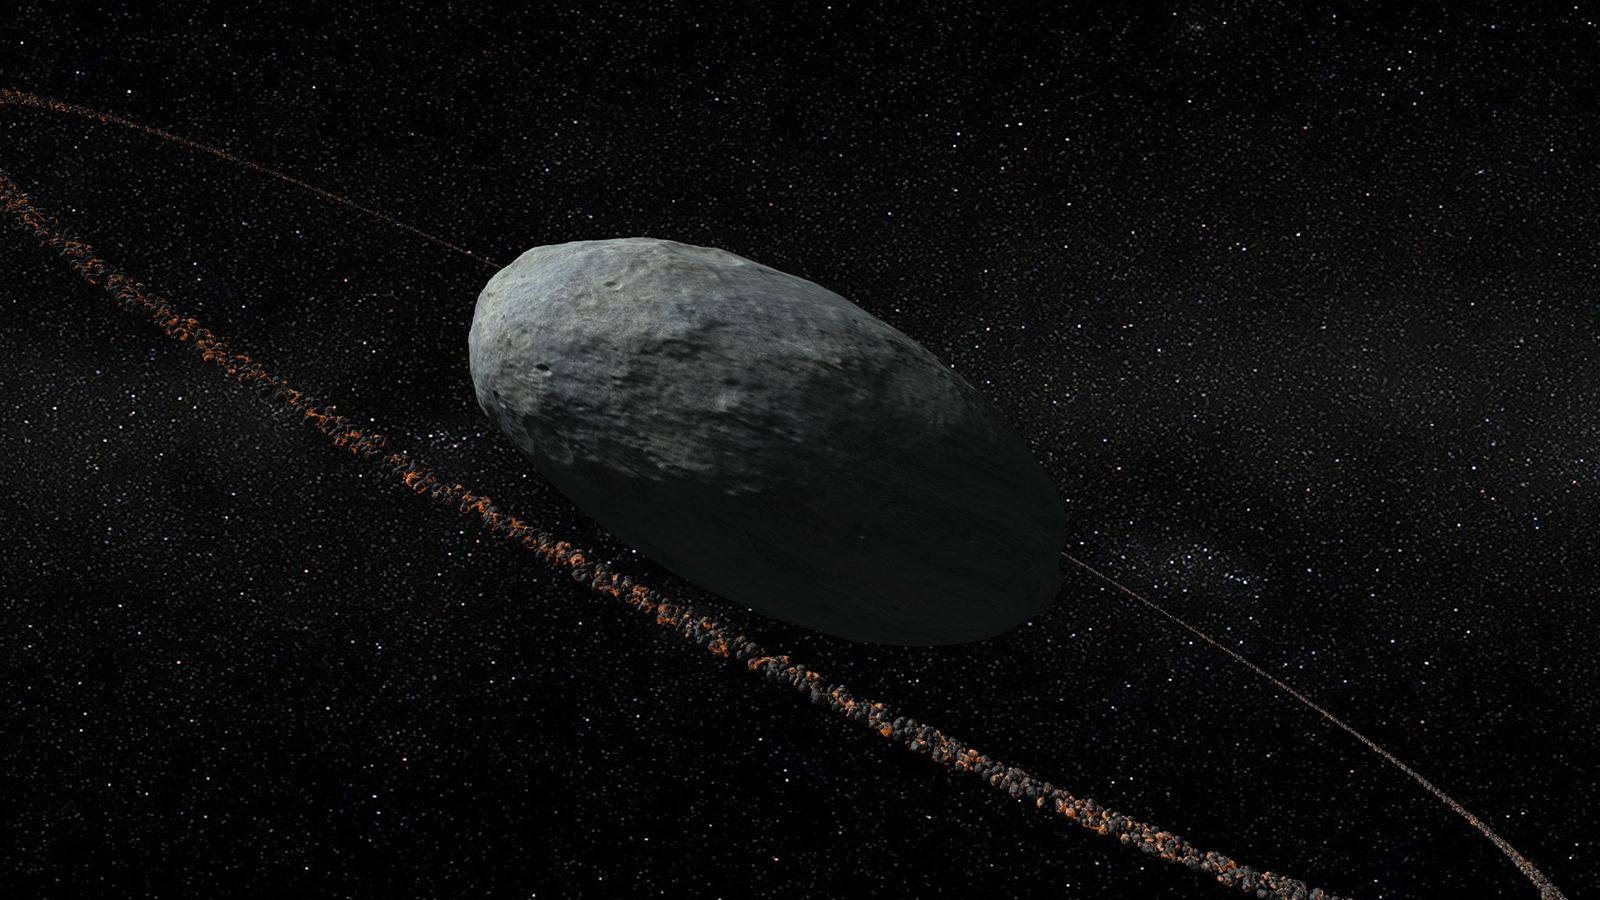 Anillos alrededor de Haumea